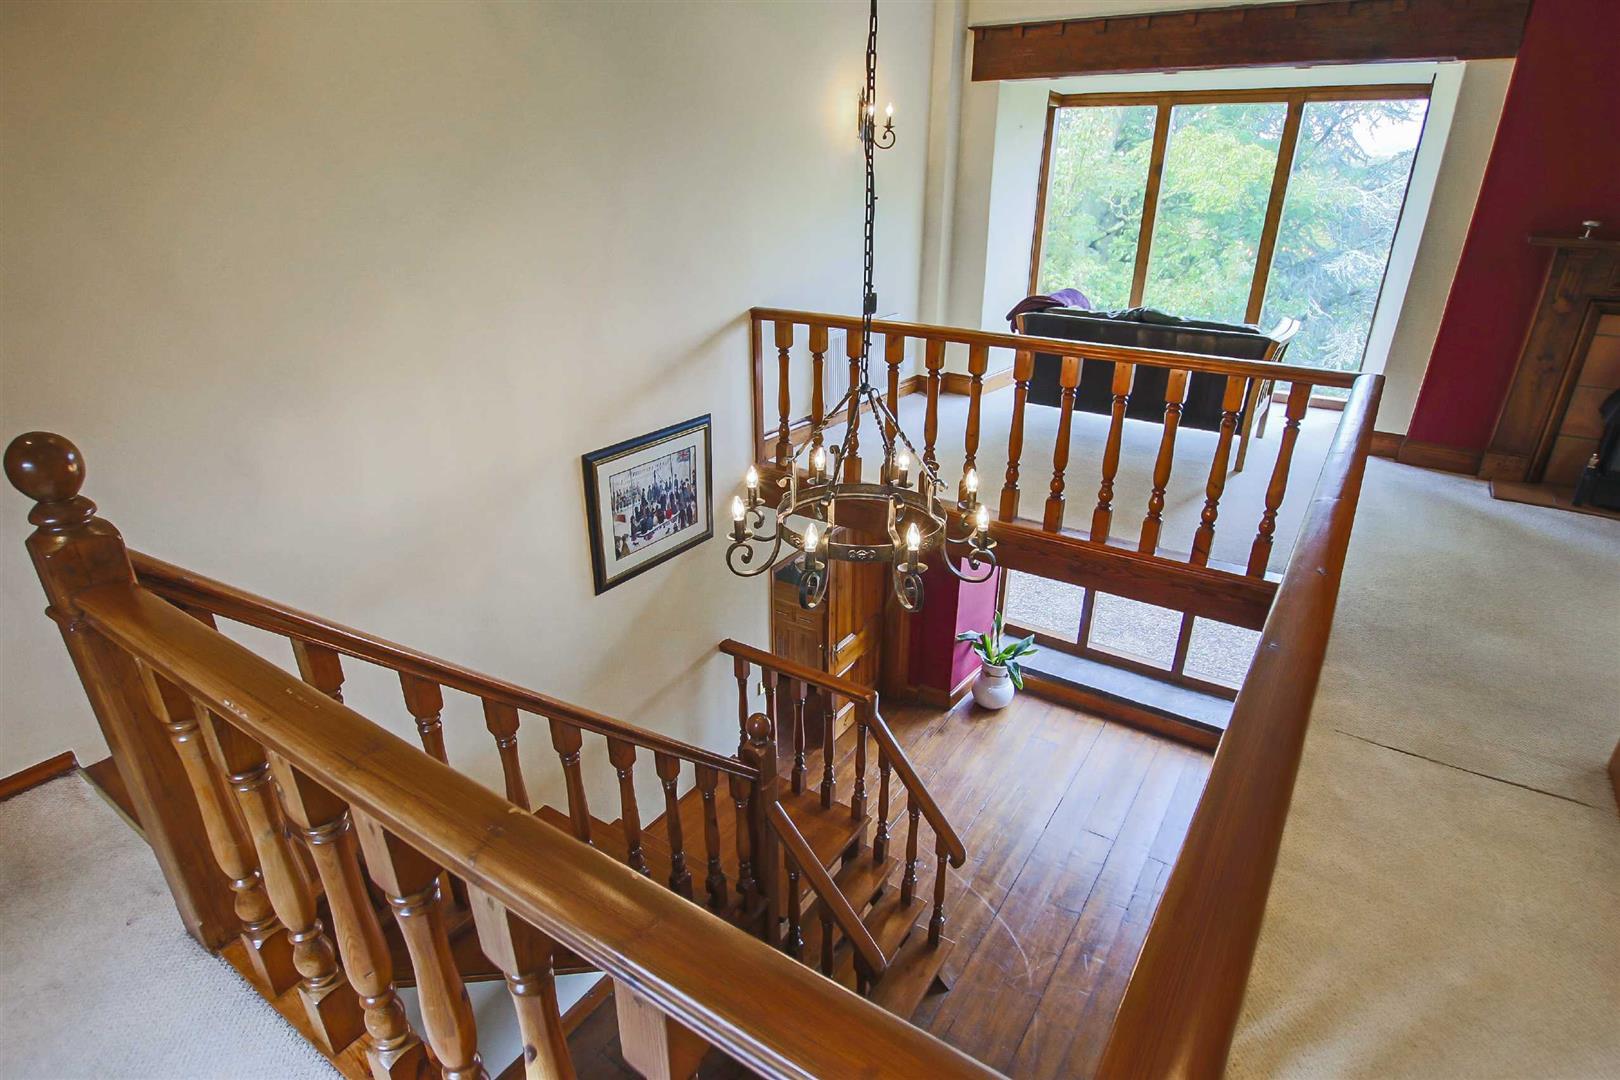 5 Bedroom Barn Conversion For Sale - p026519_14.jpg